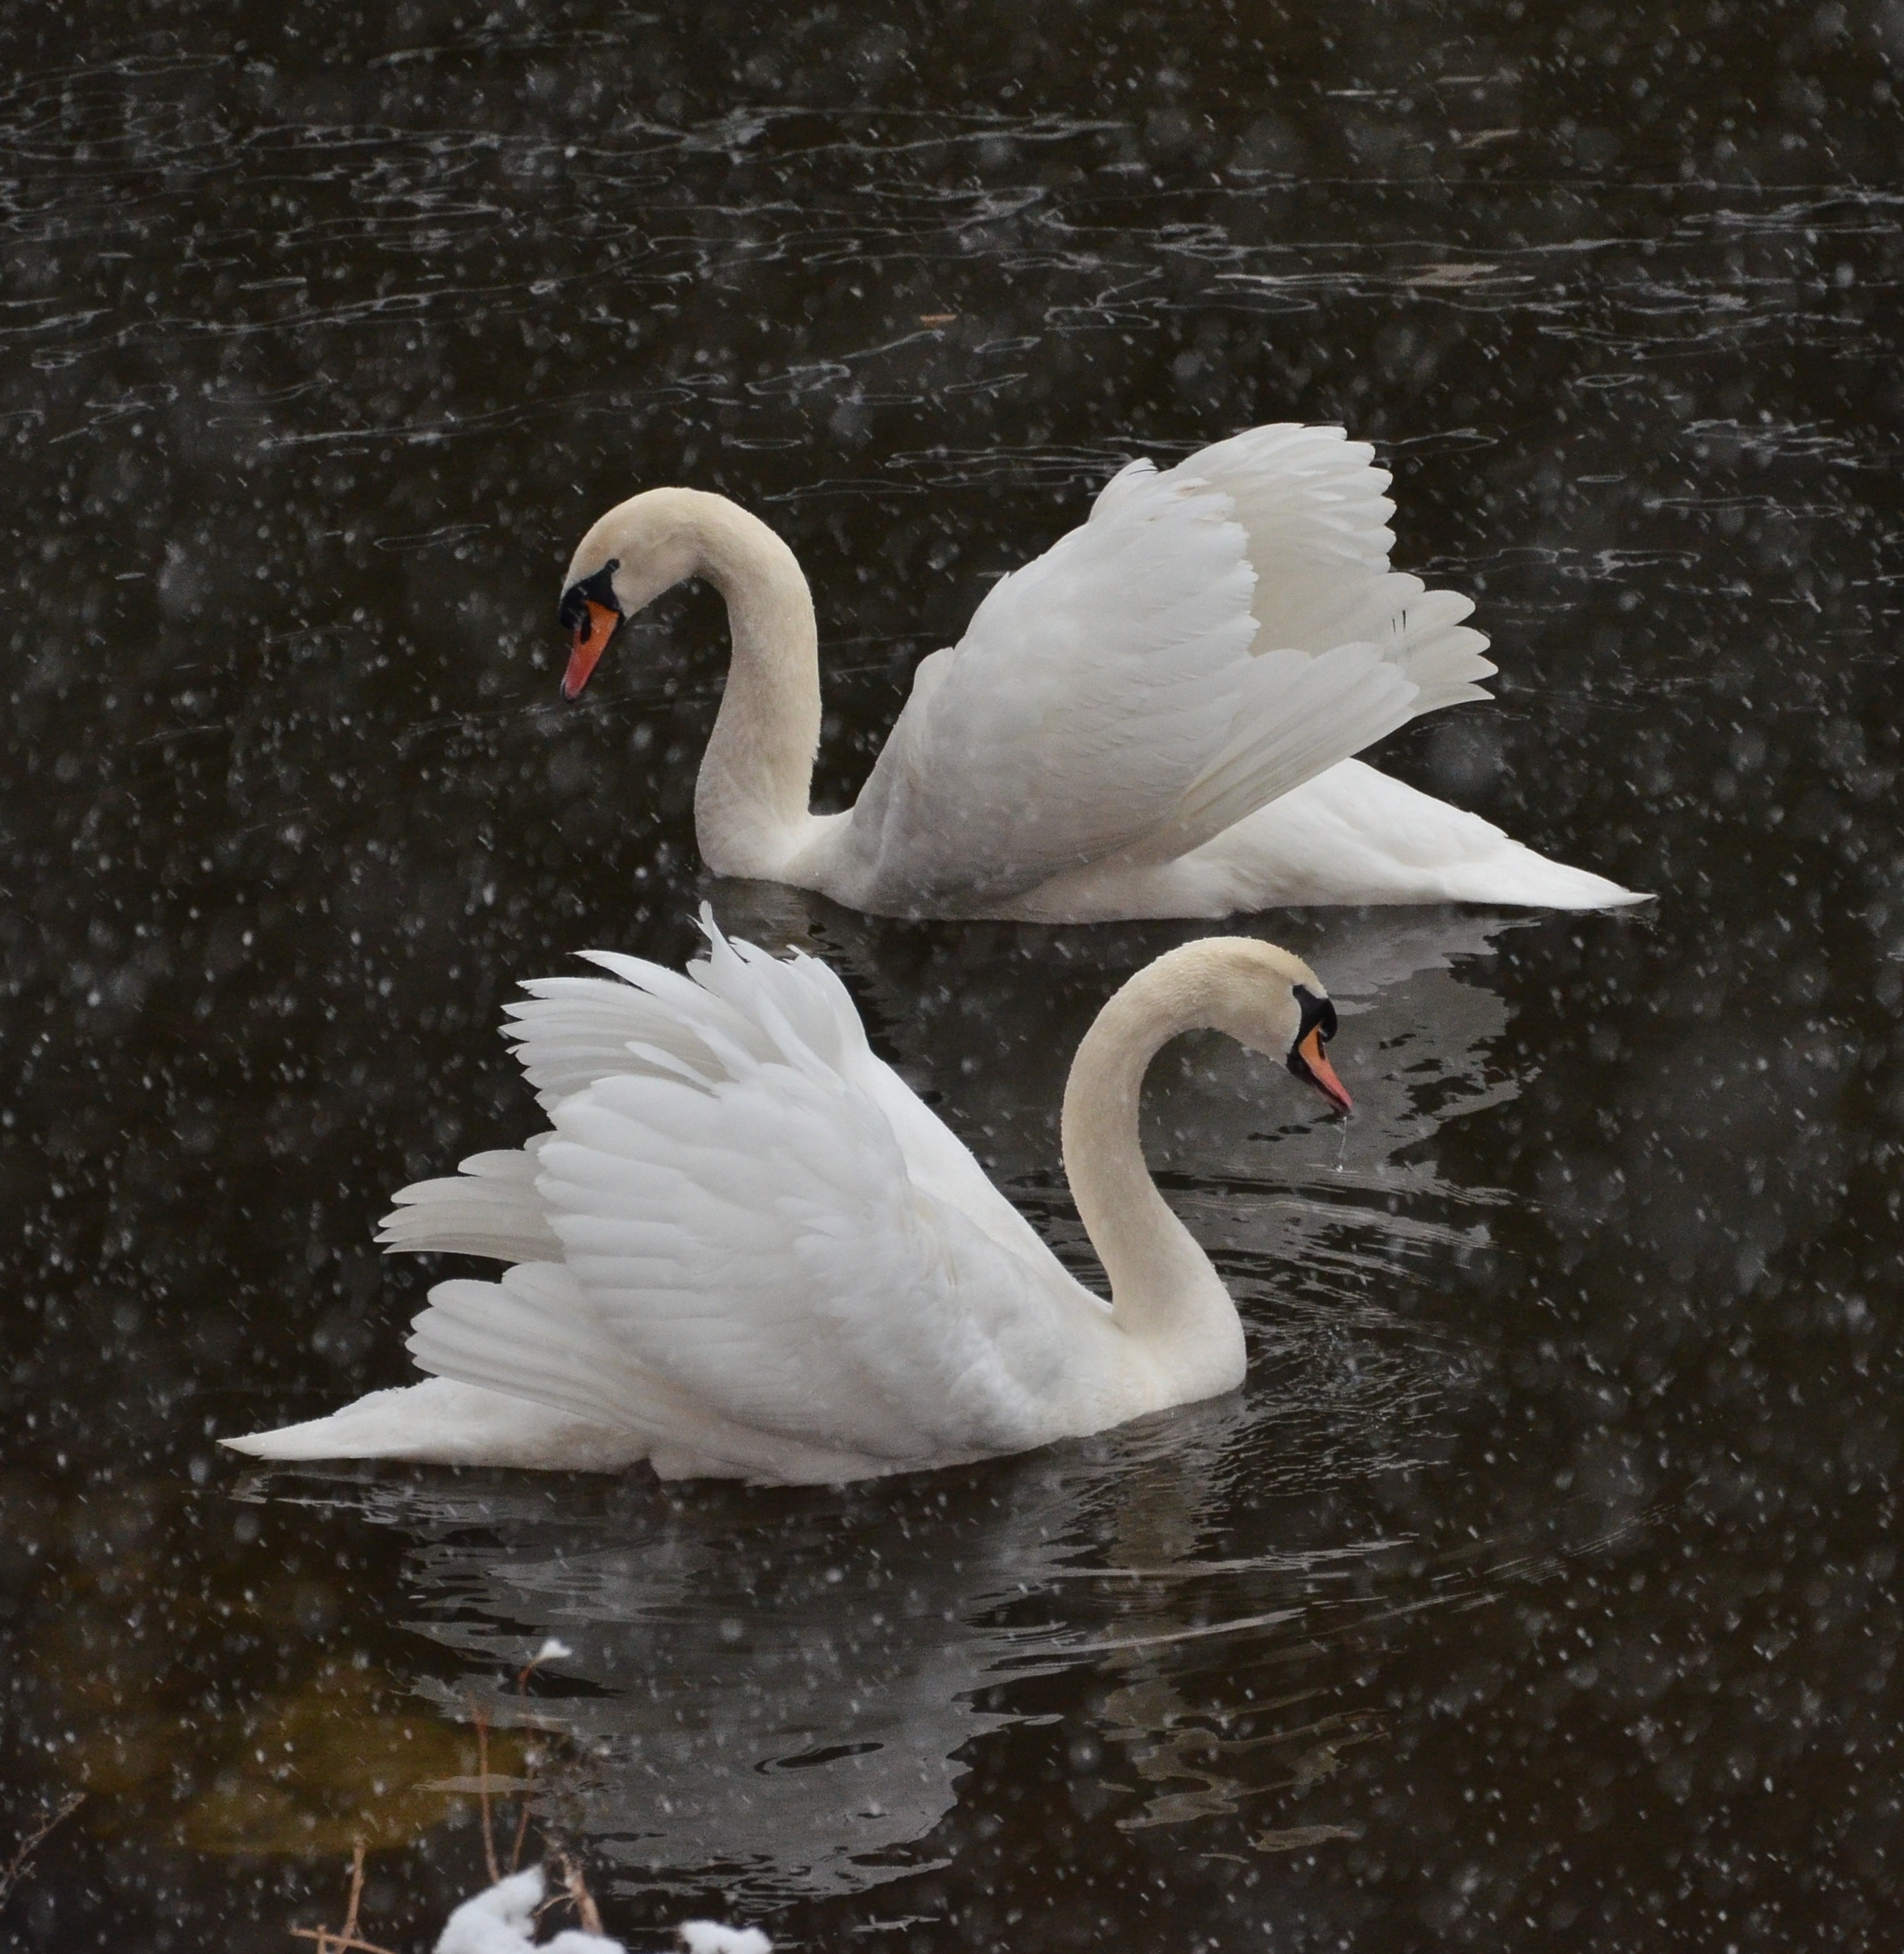 Vltava river, Swans